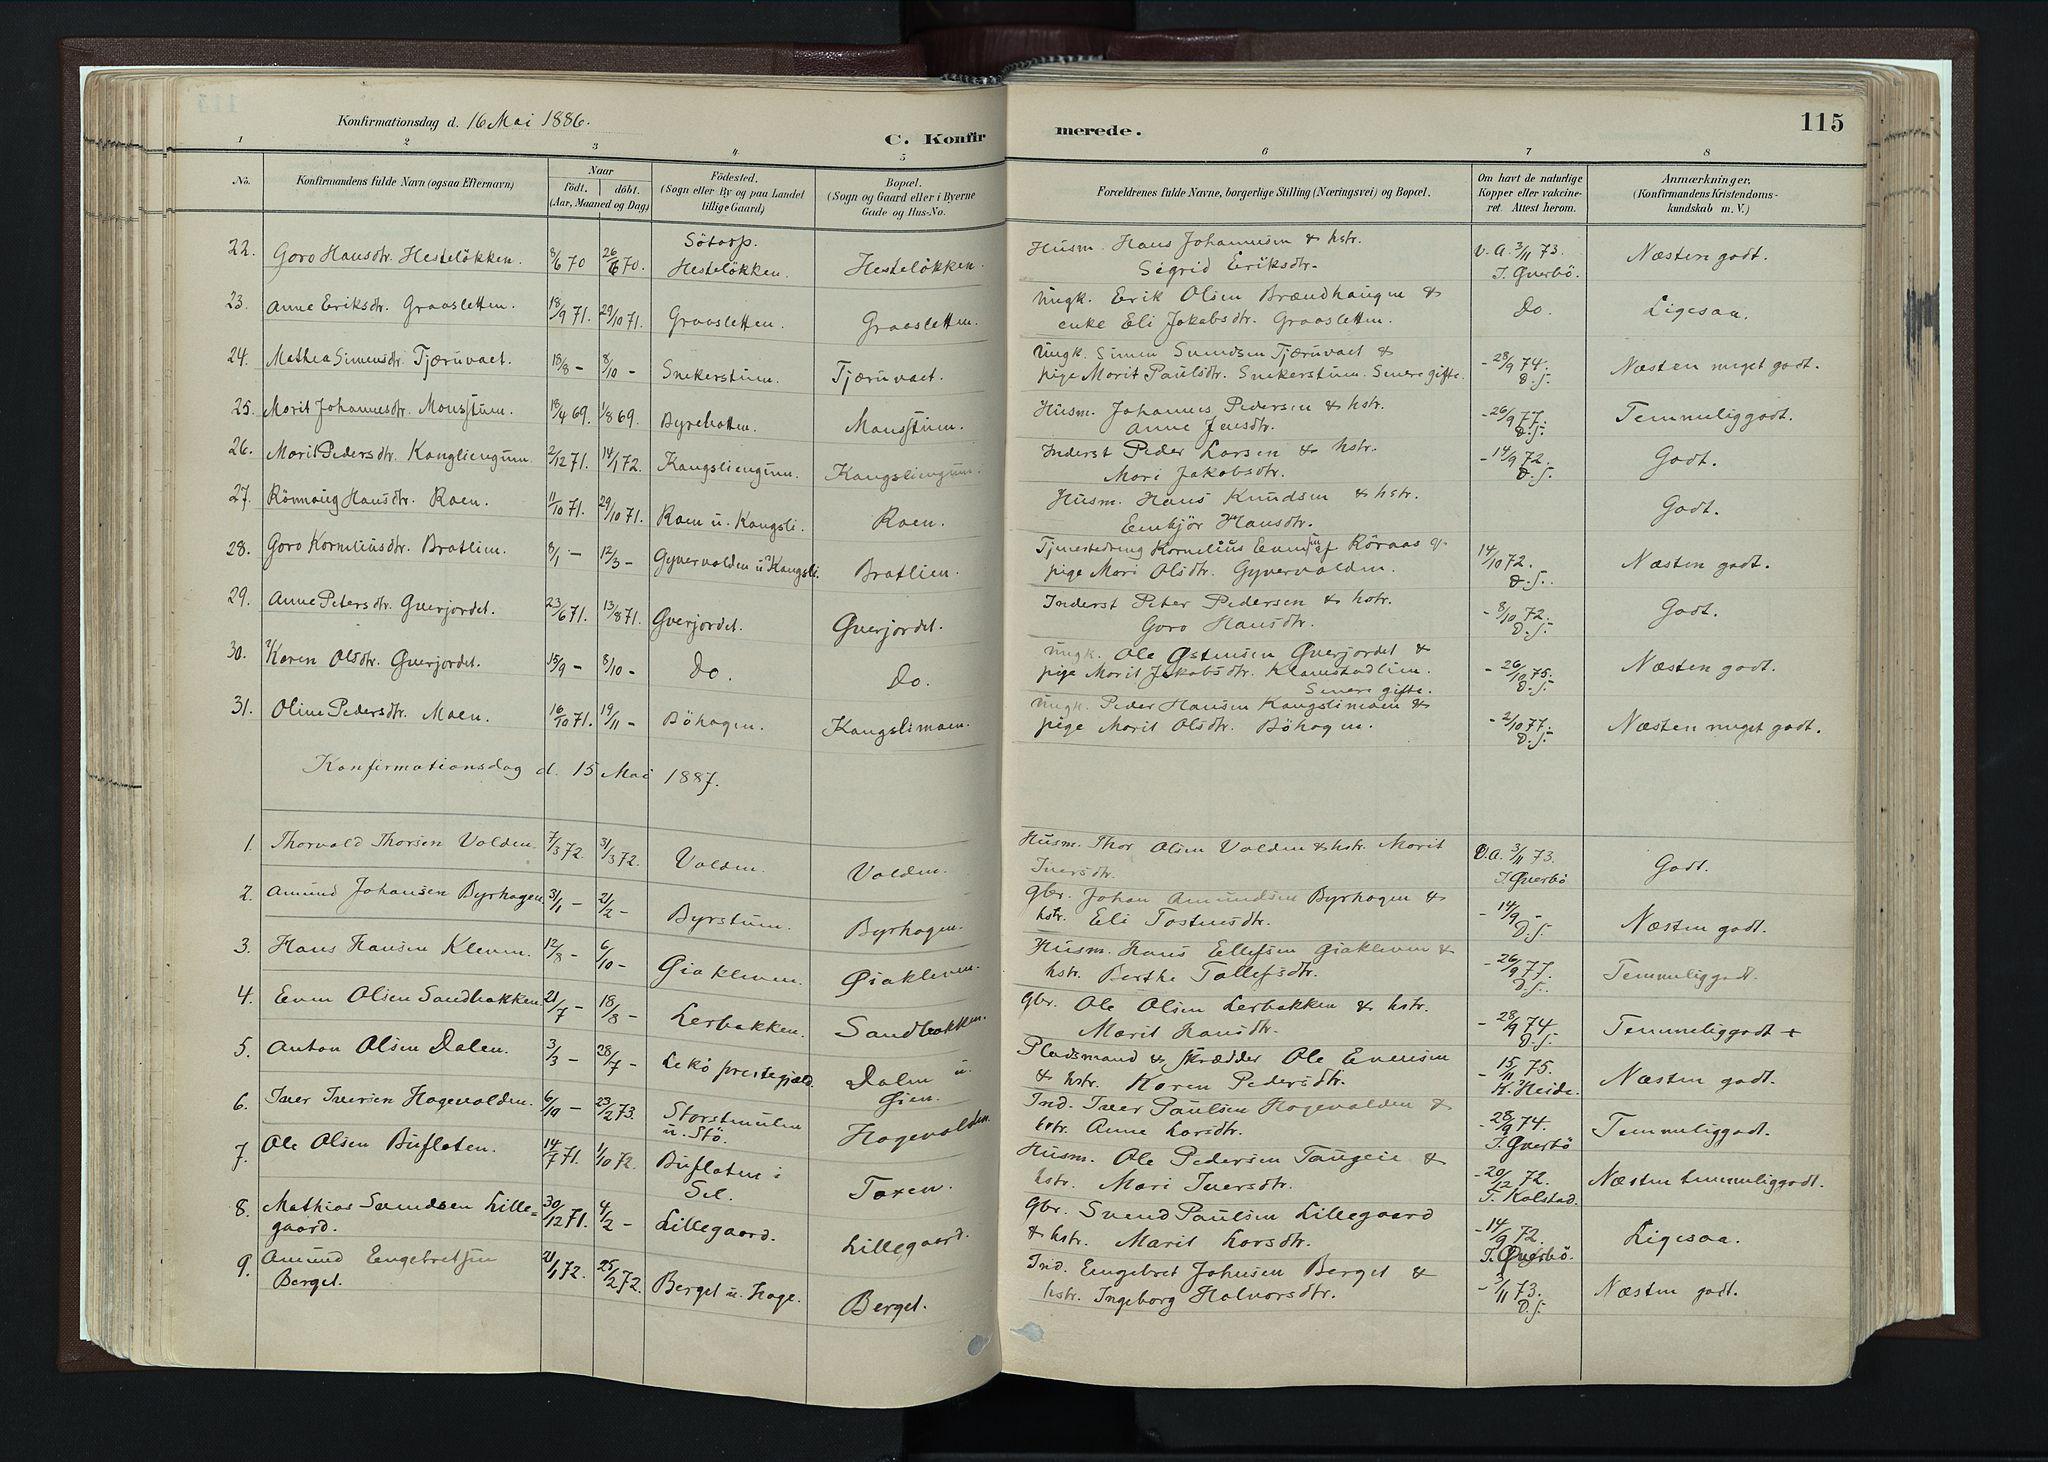 SAH, Nord-Fron prestekontor, Ministerialbok nr. 4, 1884-1914, s. 115